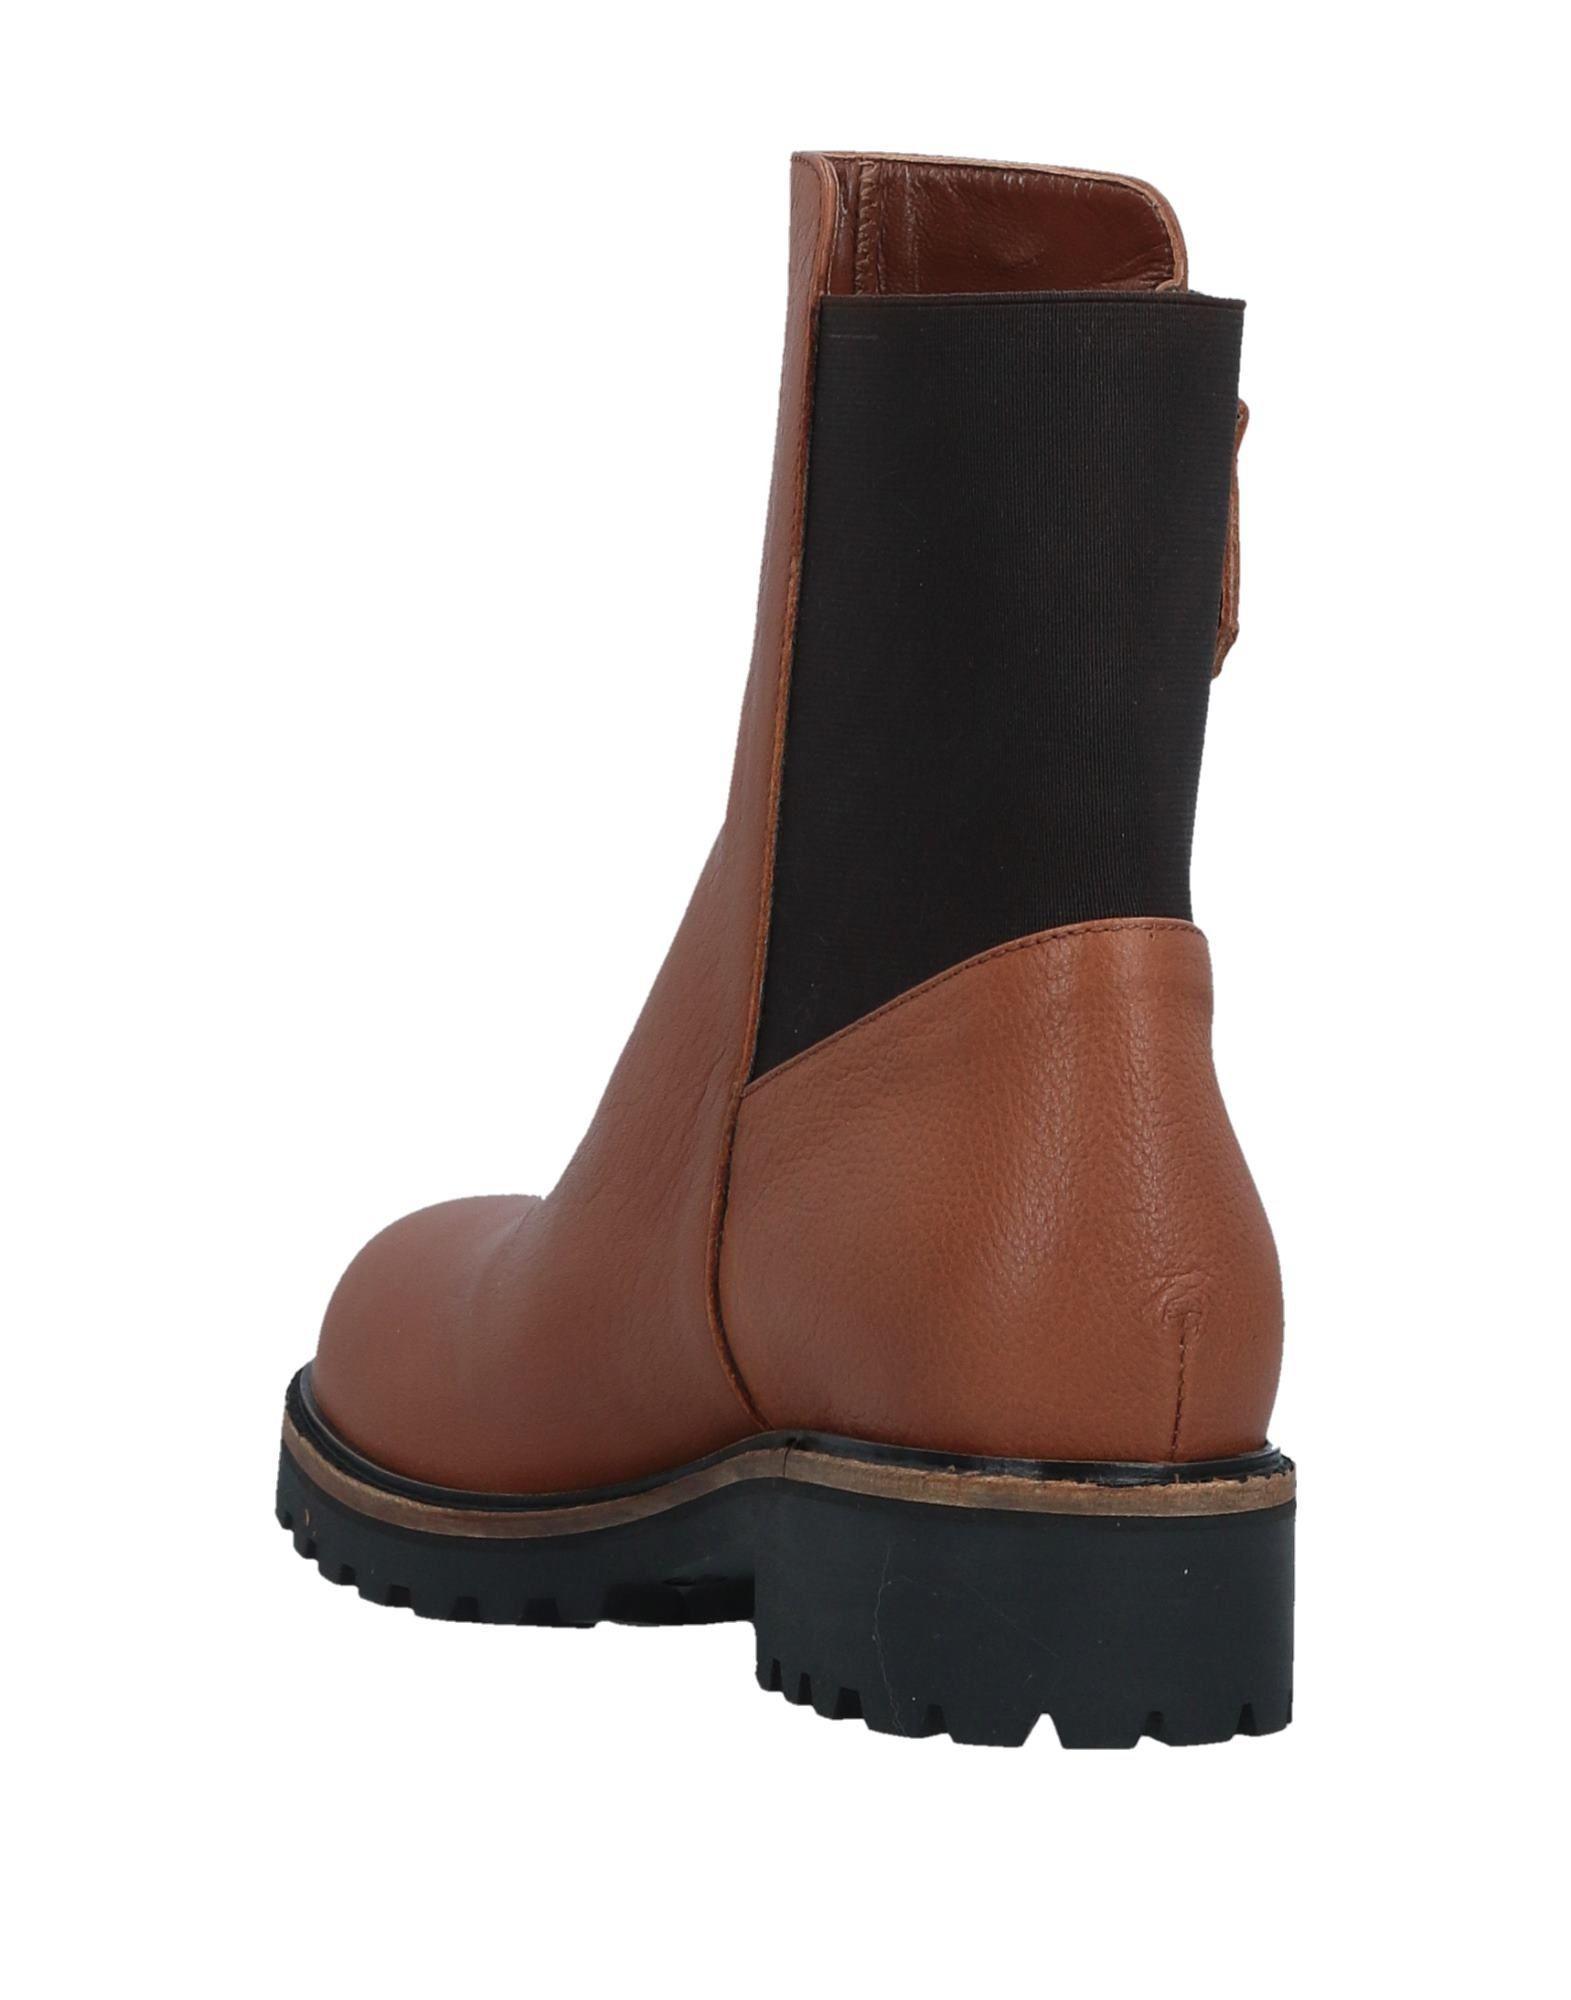 F.lli Bruglia Leather Ankle Boots in Tan (Brown)